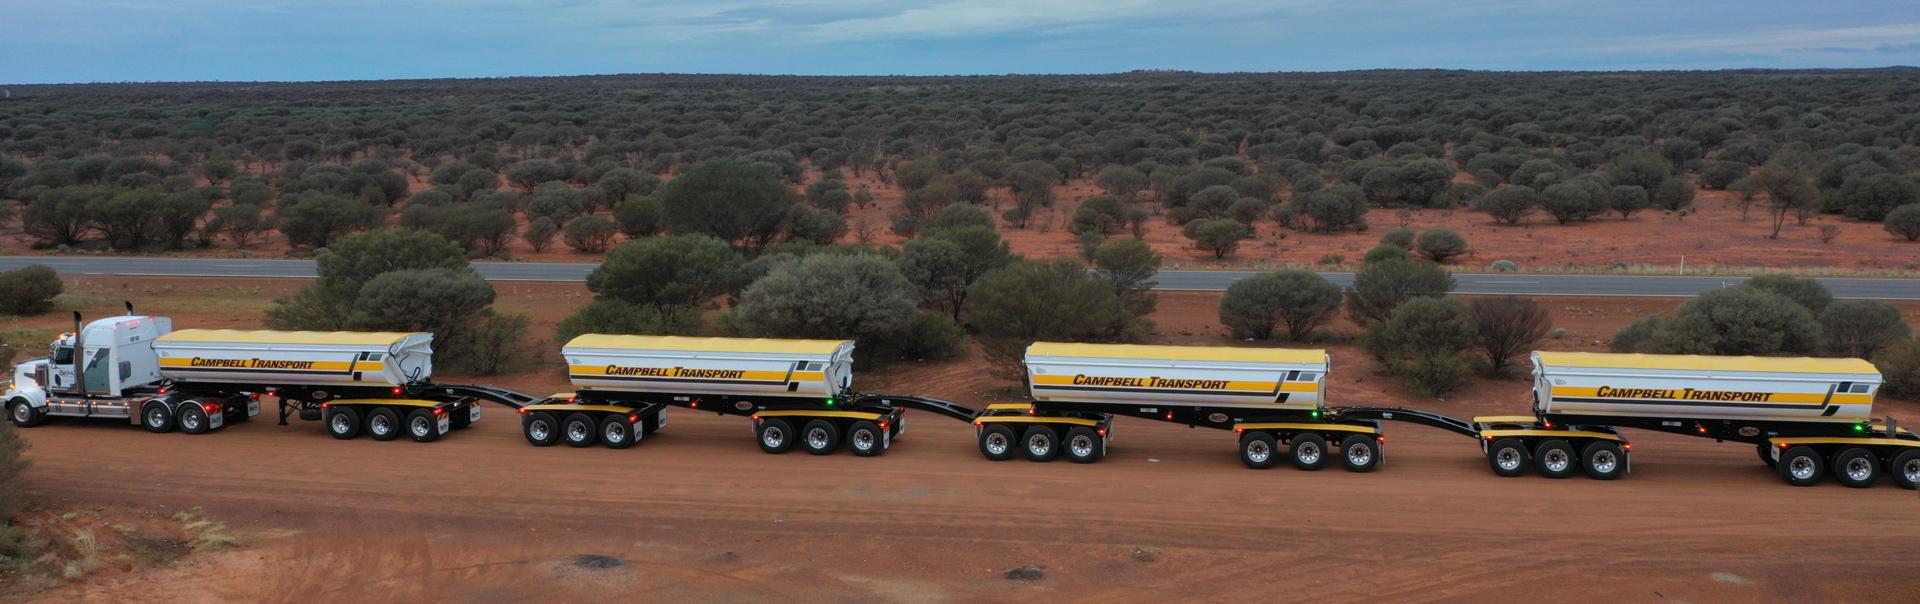 A road train of side dump trailers in Australia